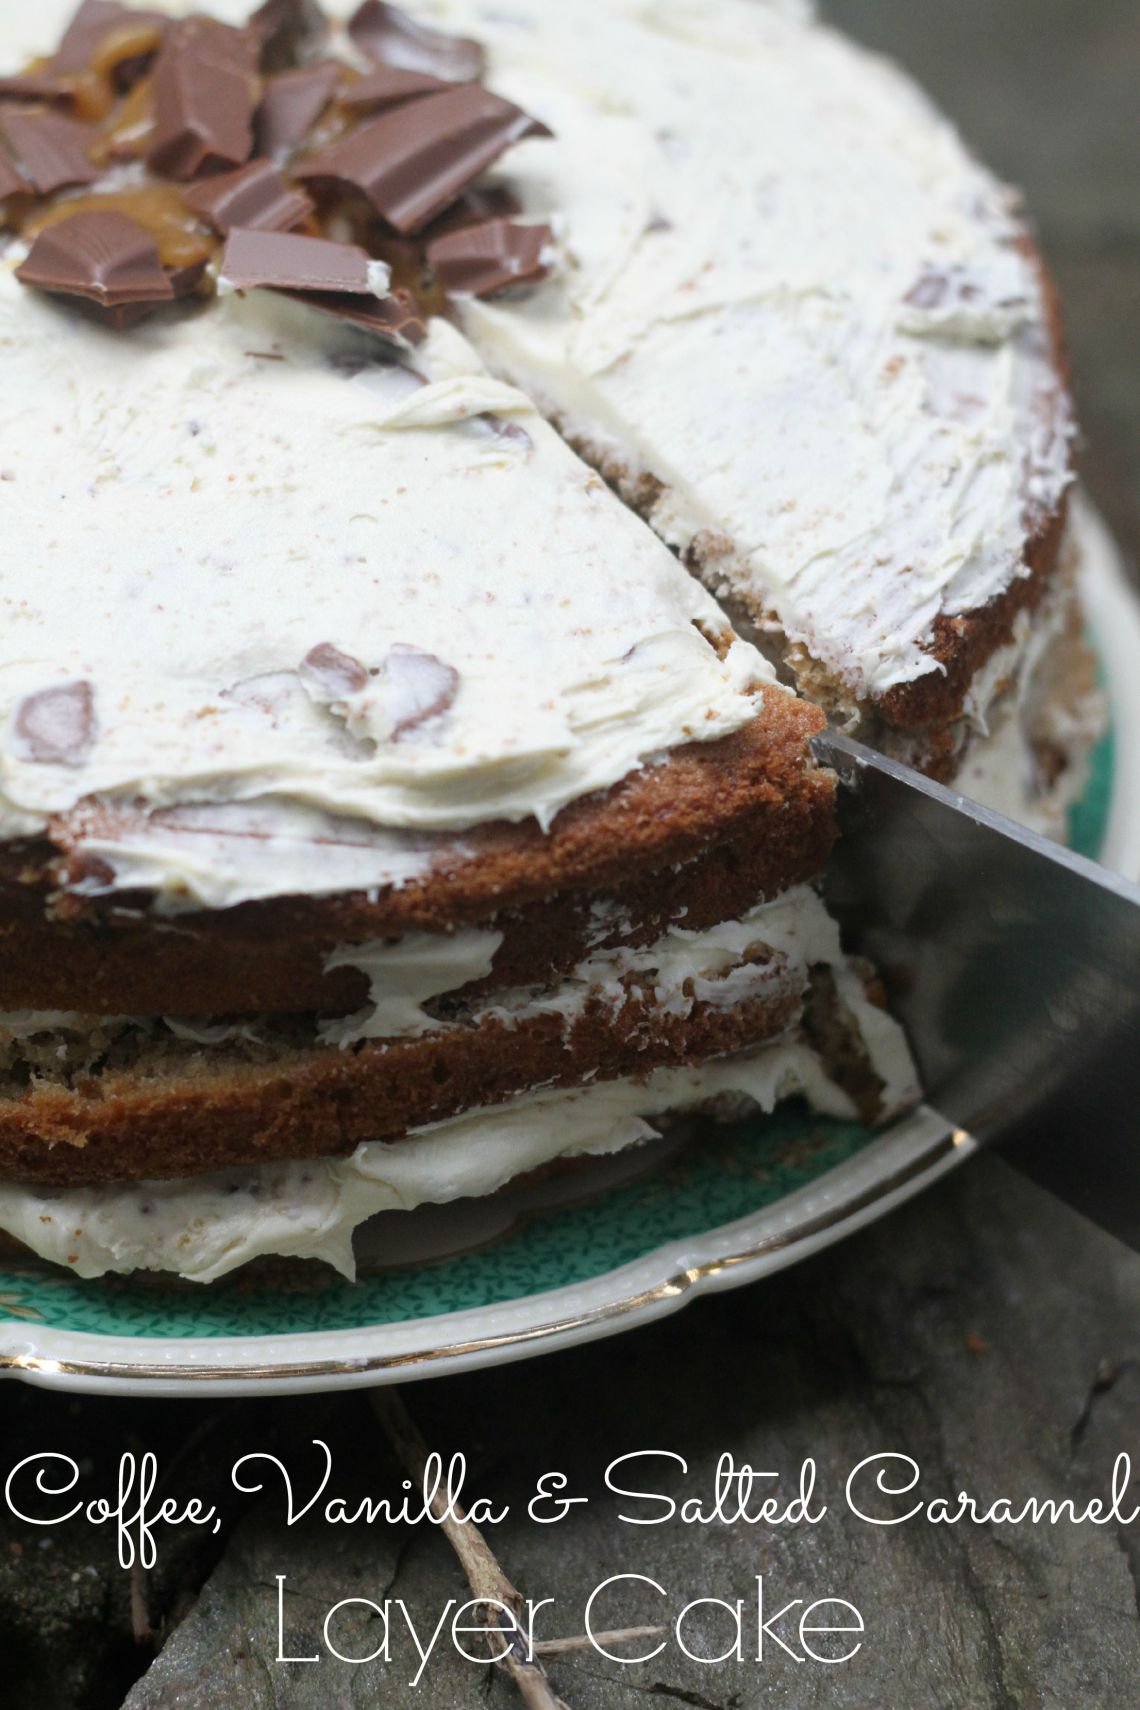 coffee, vanilla & salted caramel layer cake